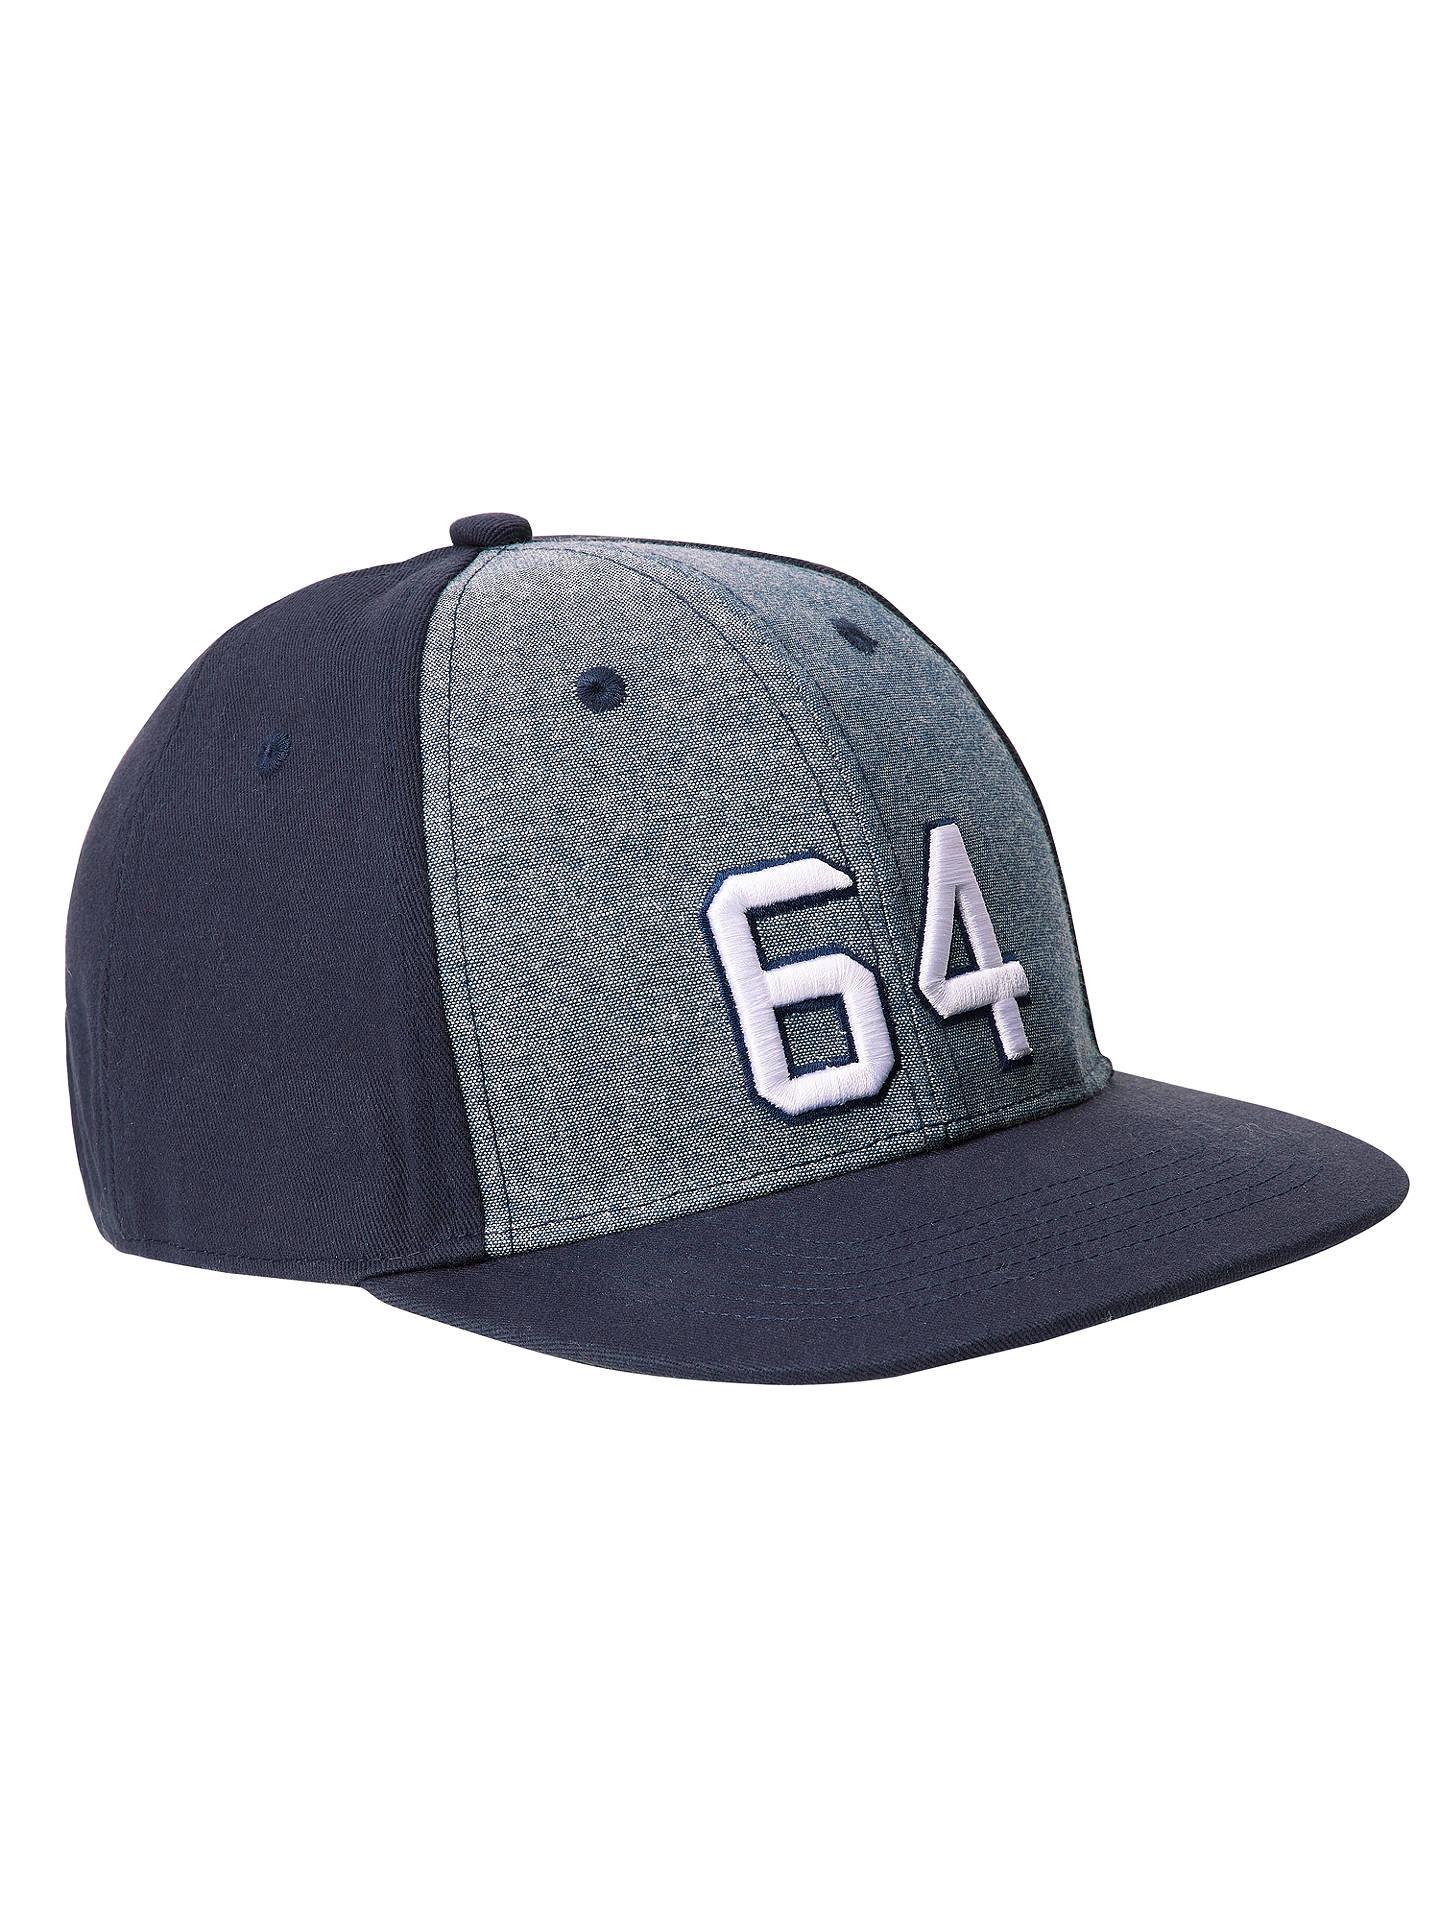 b2e46f5ba98 BuyJohn Lewis   Partners Children s Chambray Baseball Cap